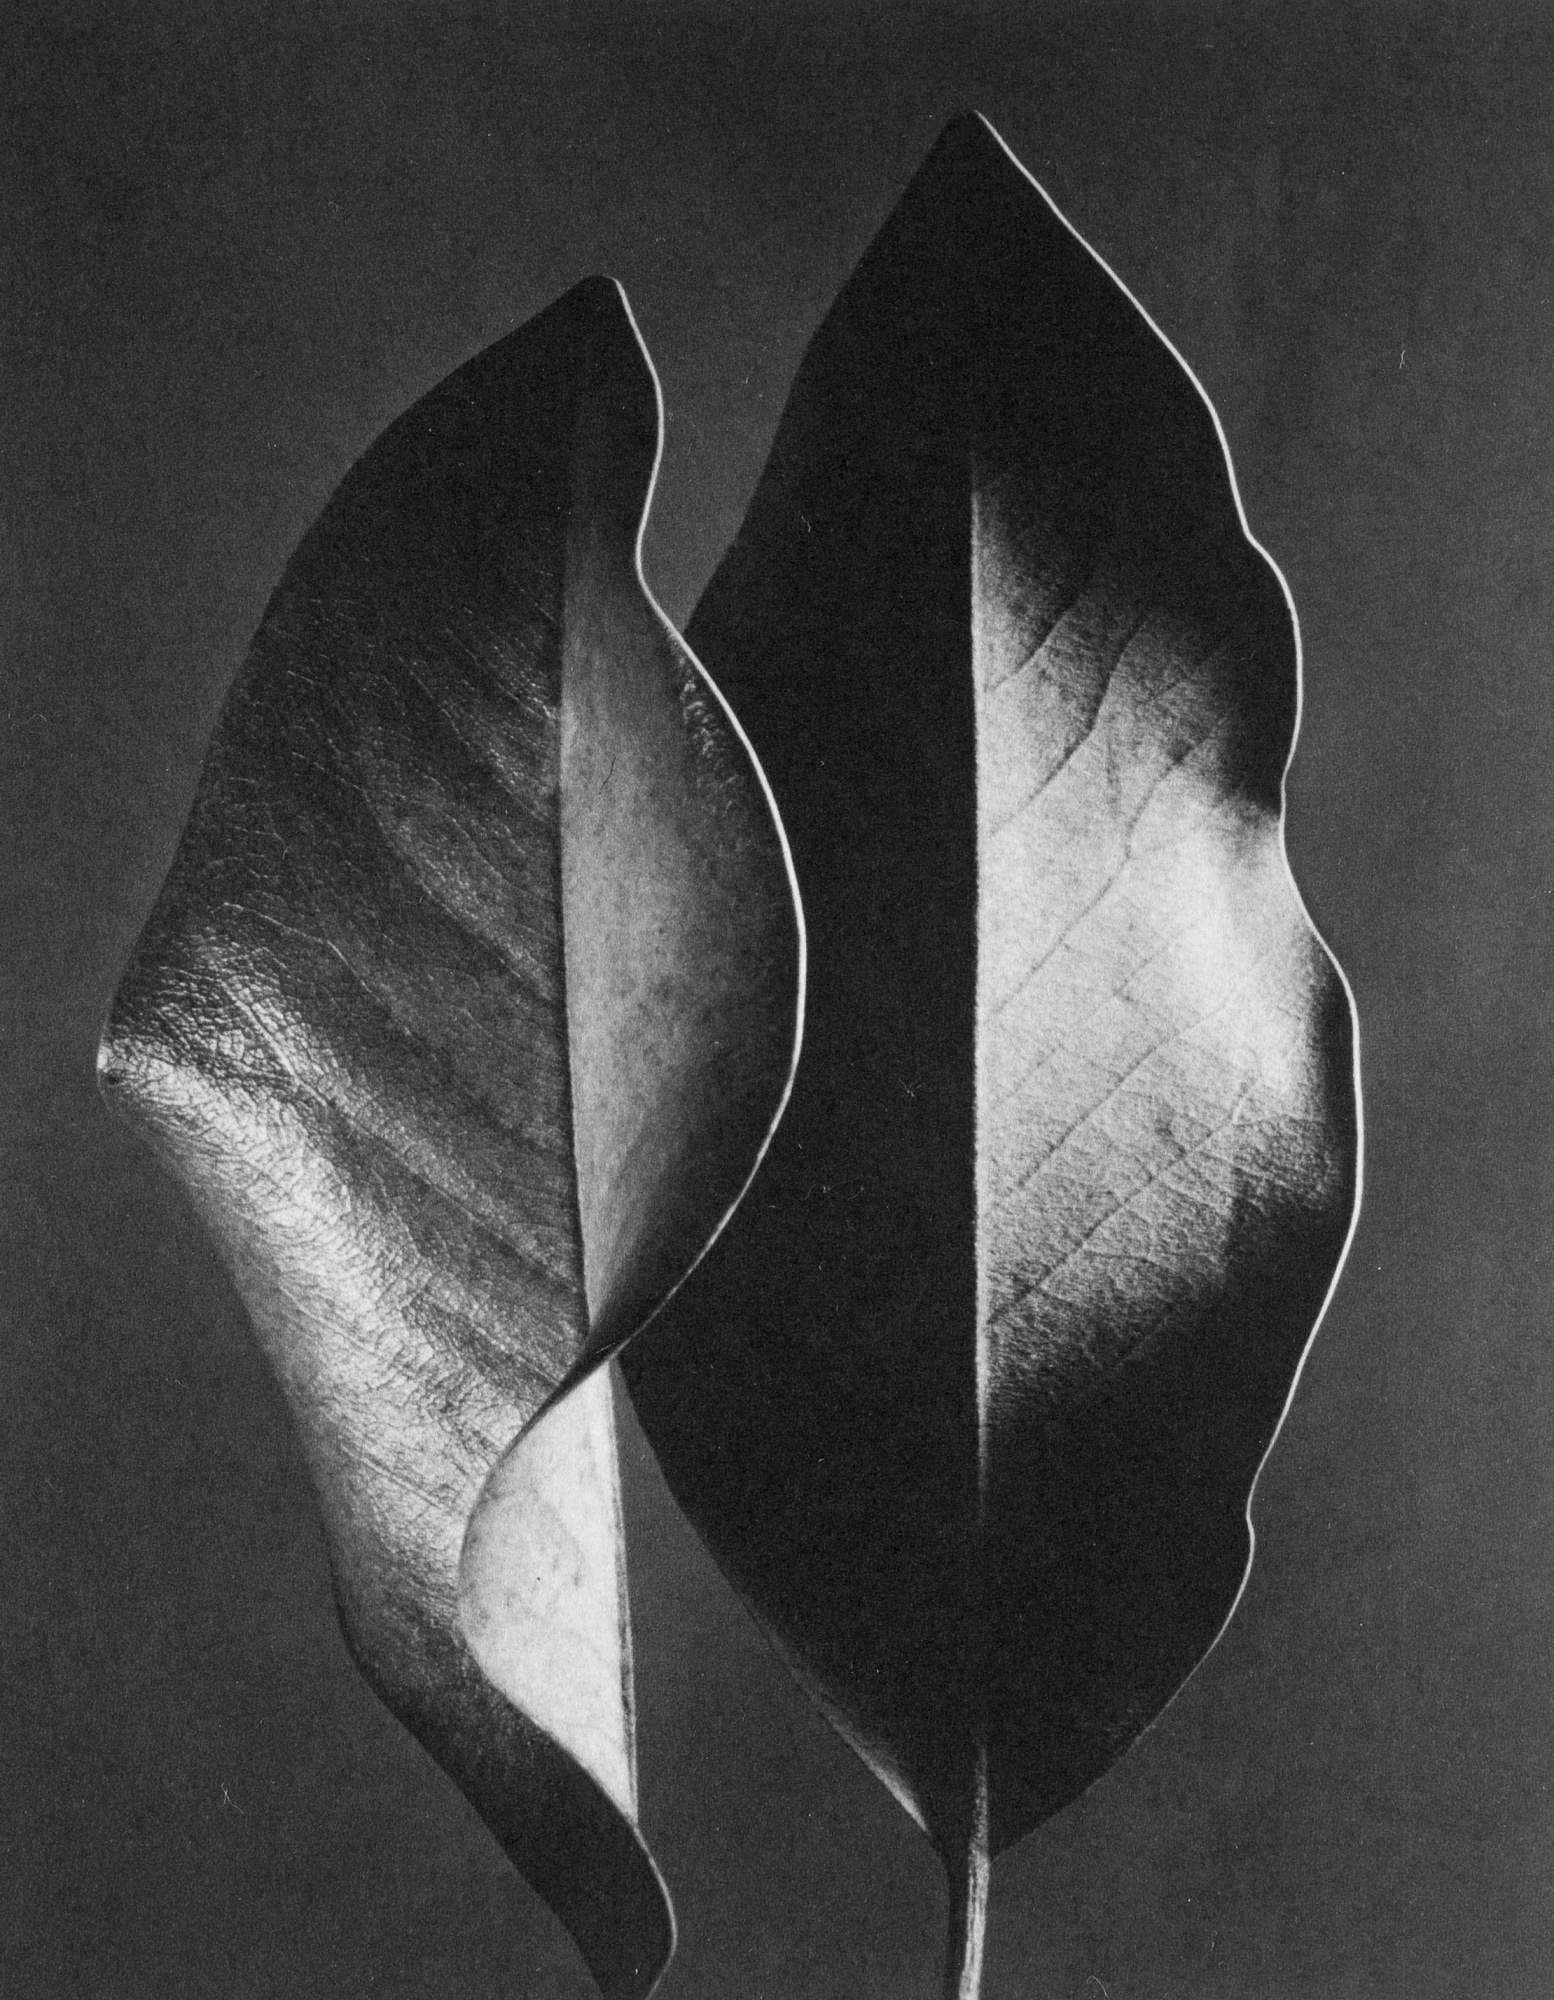 Ruth Bernhard, Two Leaves